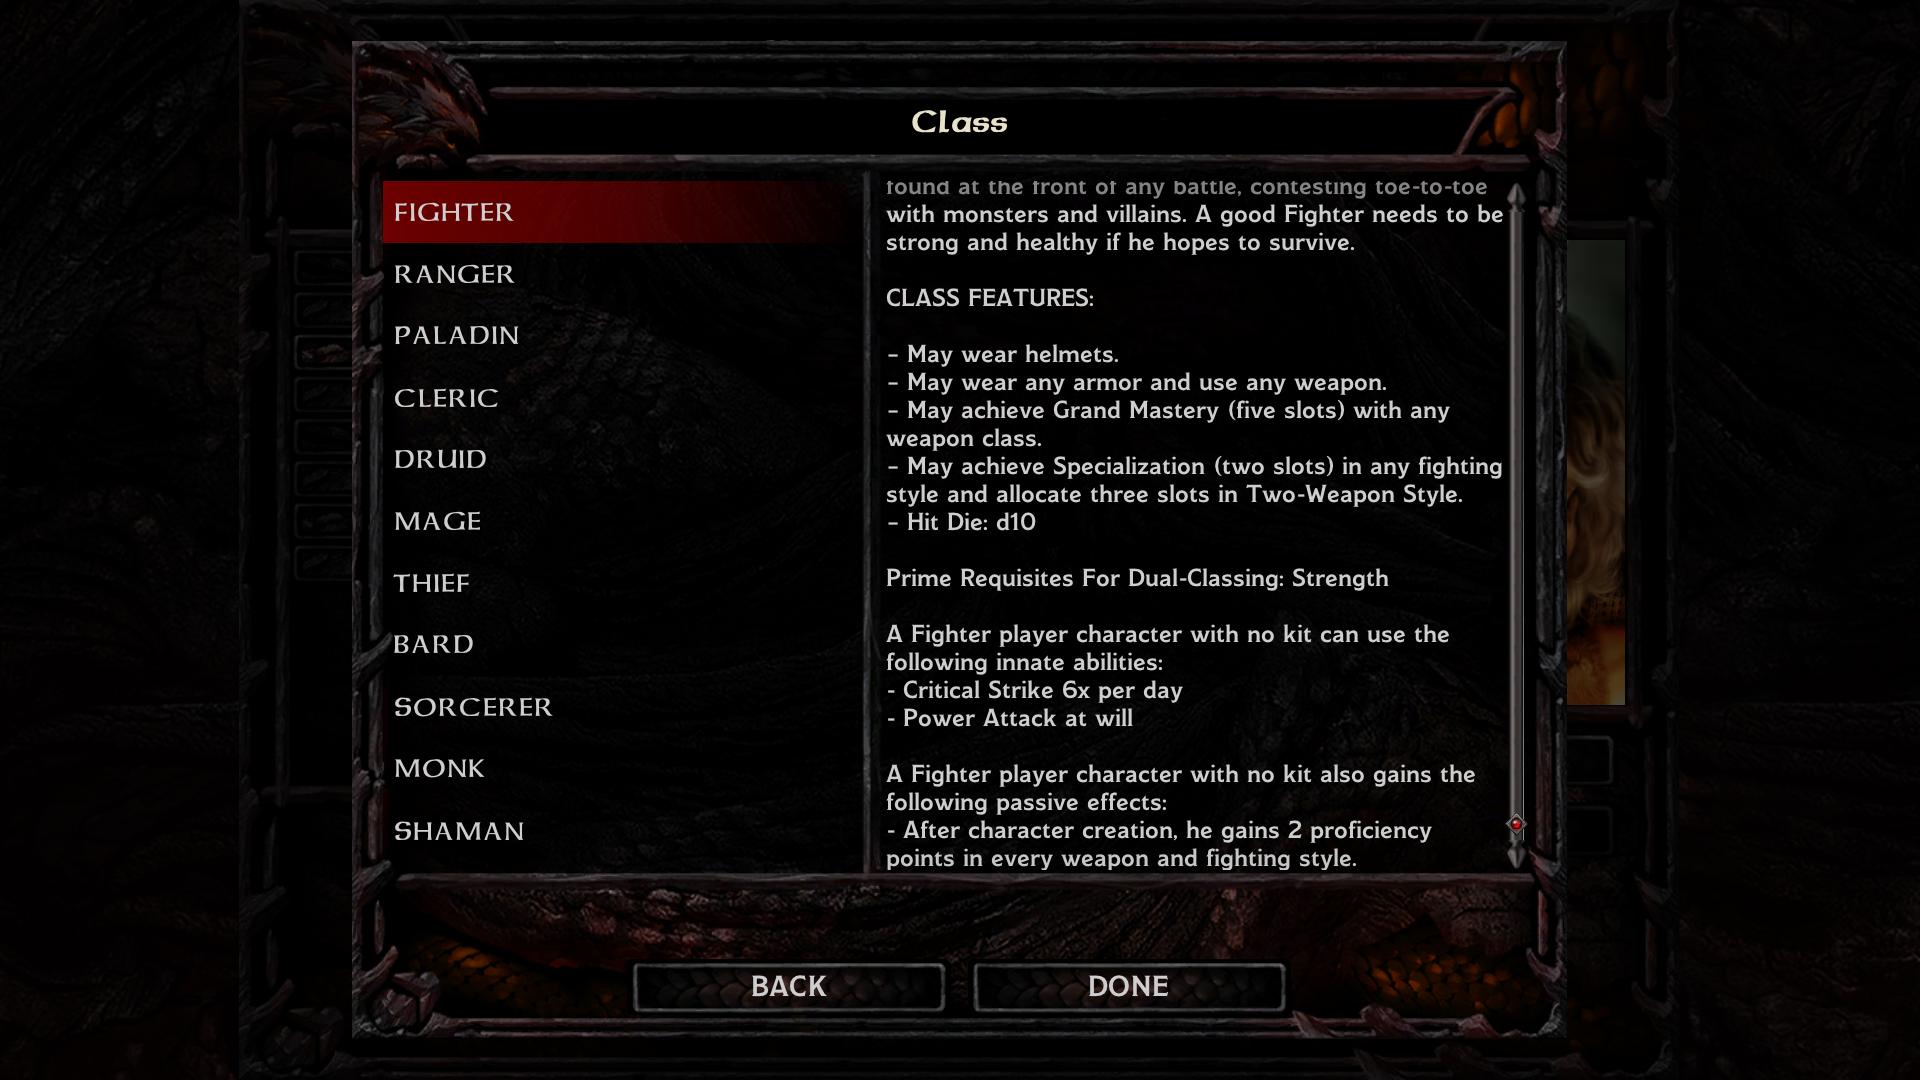 uskomaton valinta halpa ostaa MOD] High Power Baldur's Gate v2.2.2 — Beamdog Forums